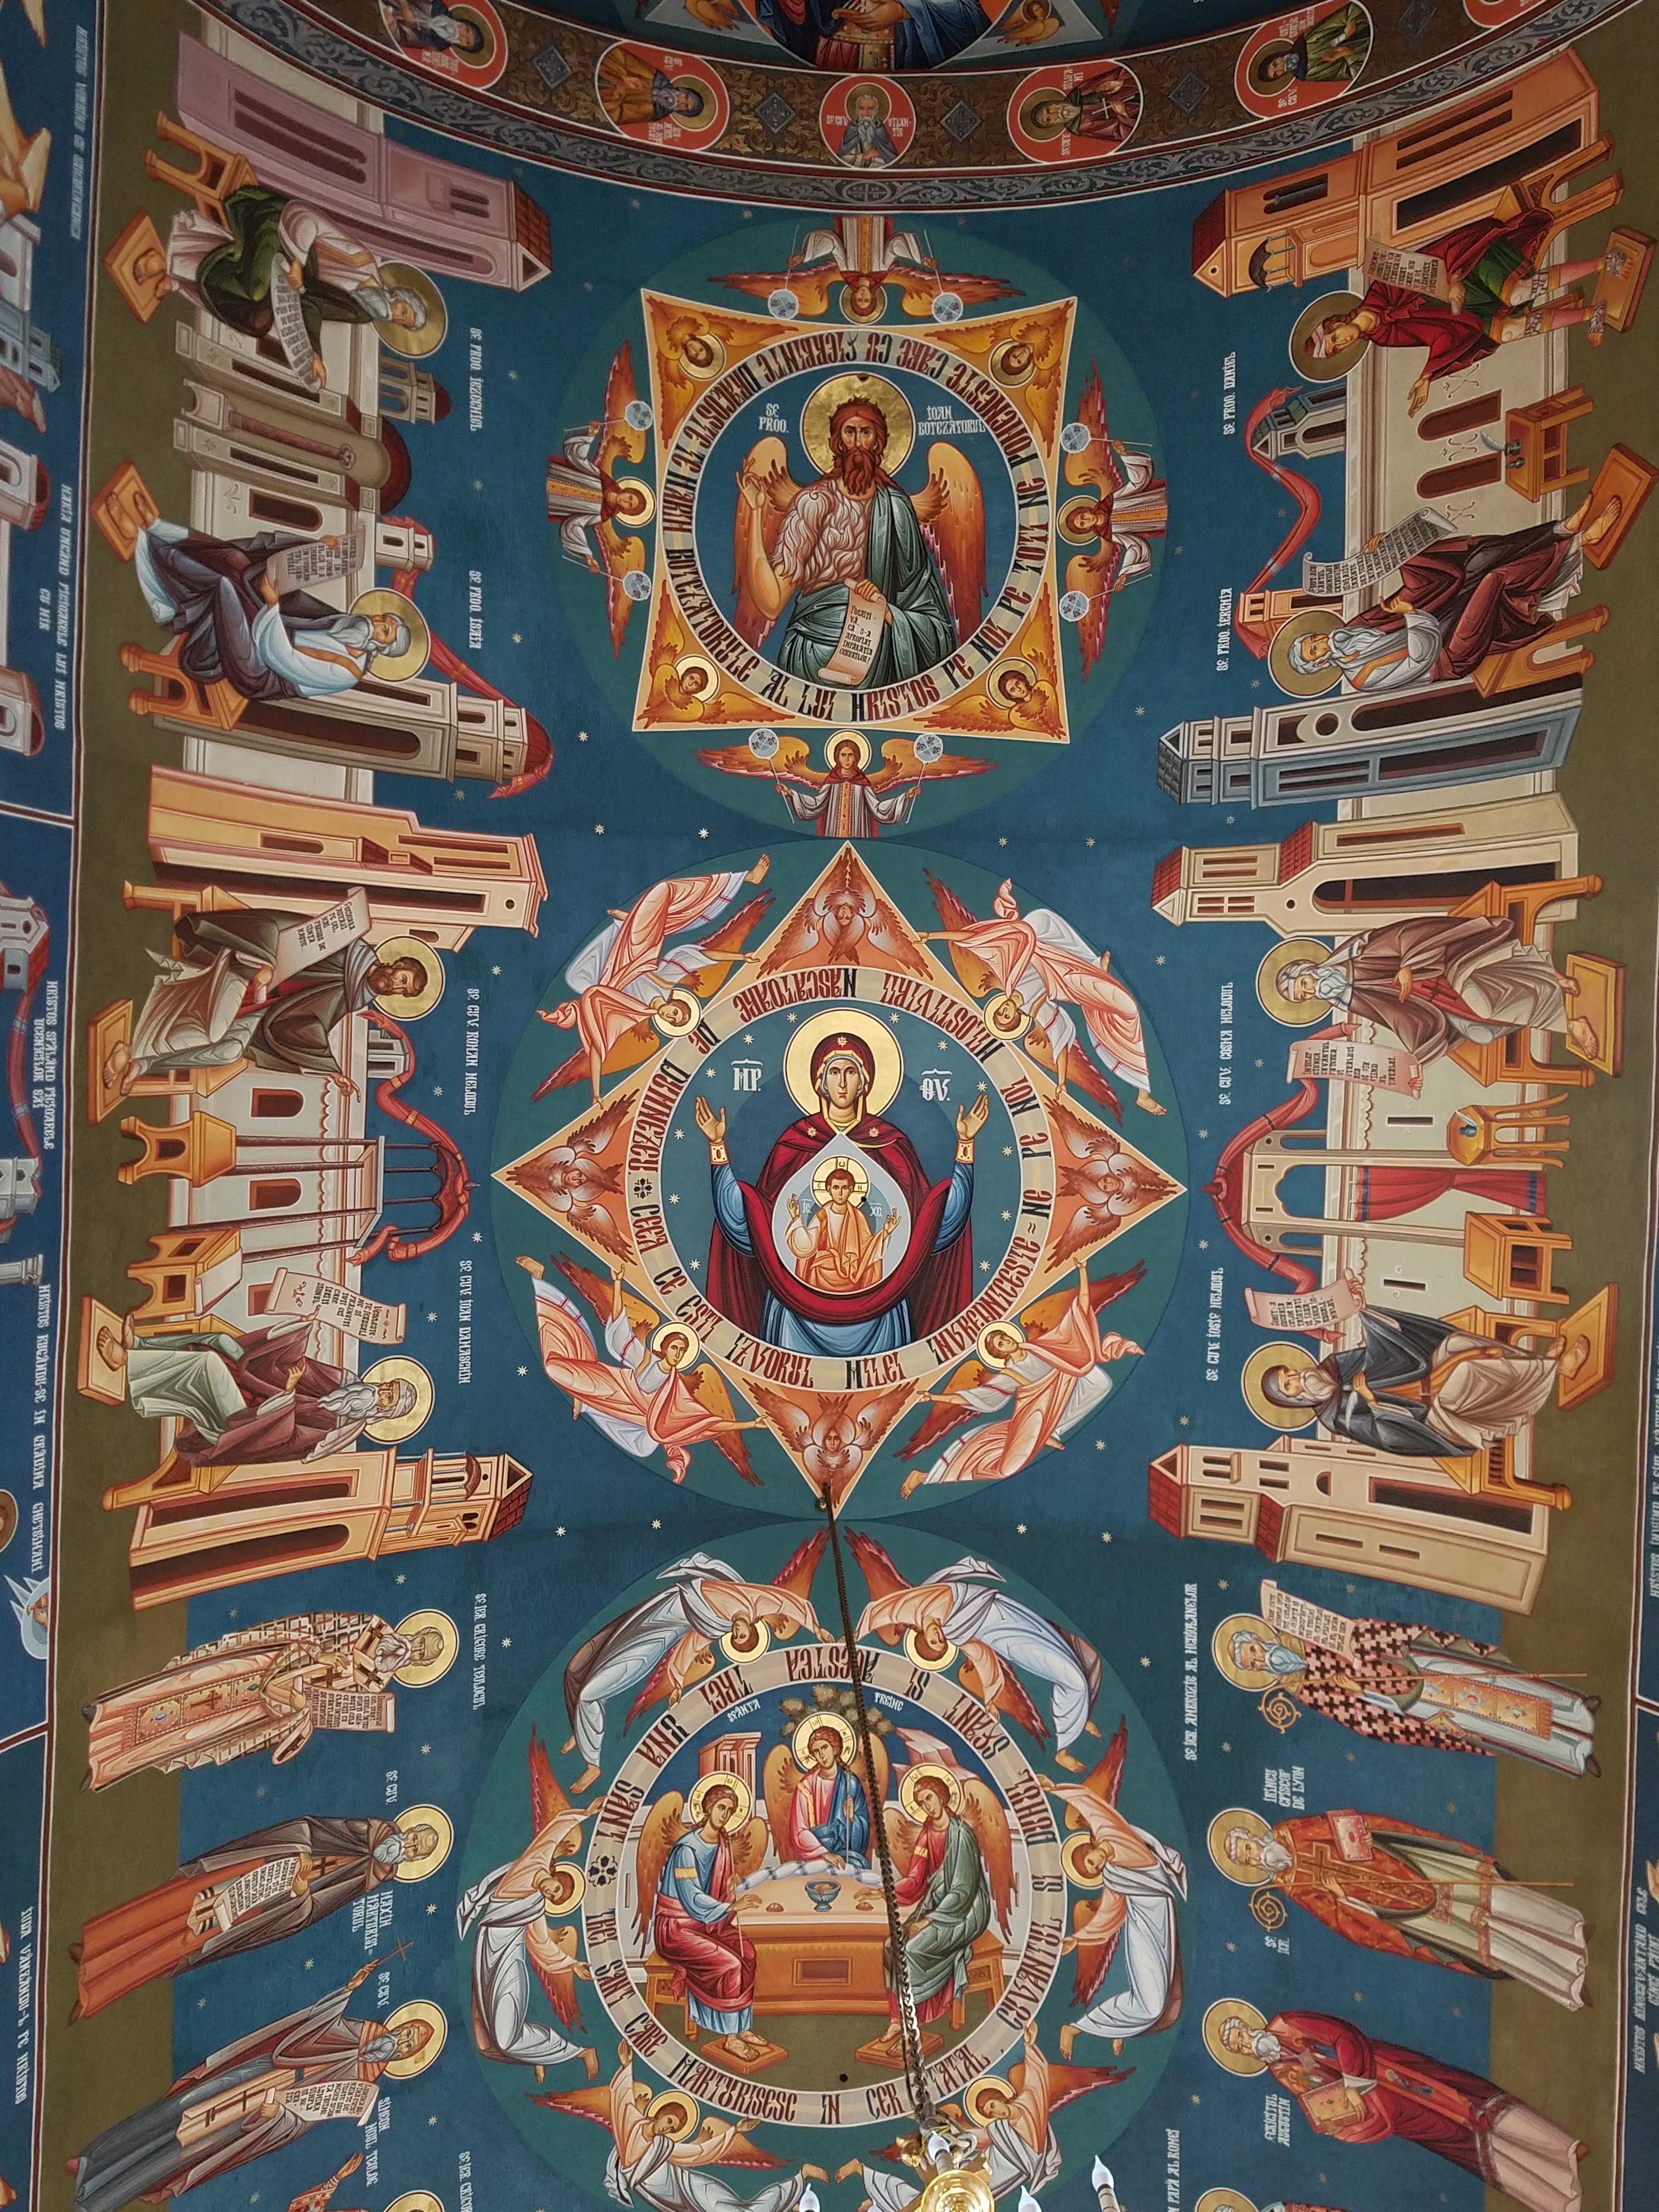 sfantul nectarie church iasi romania